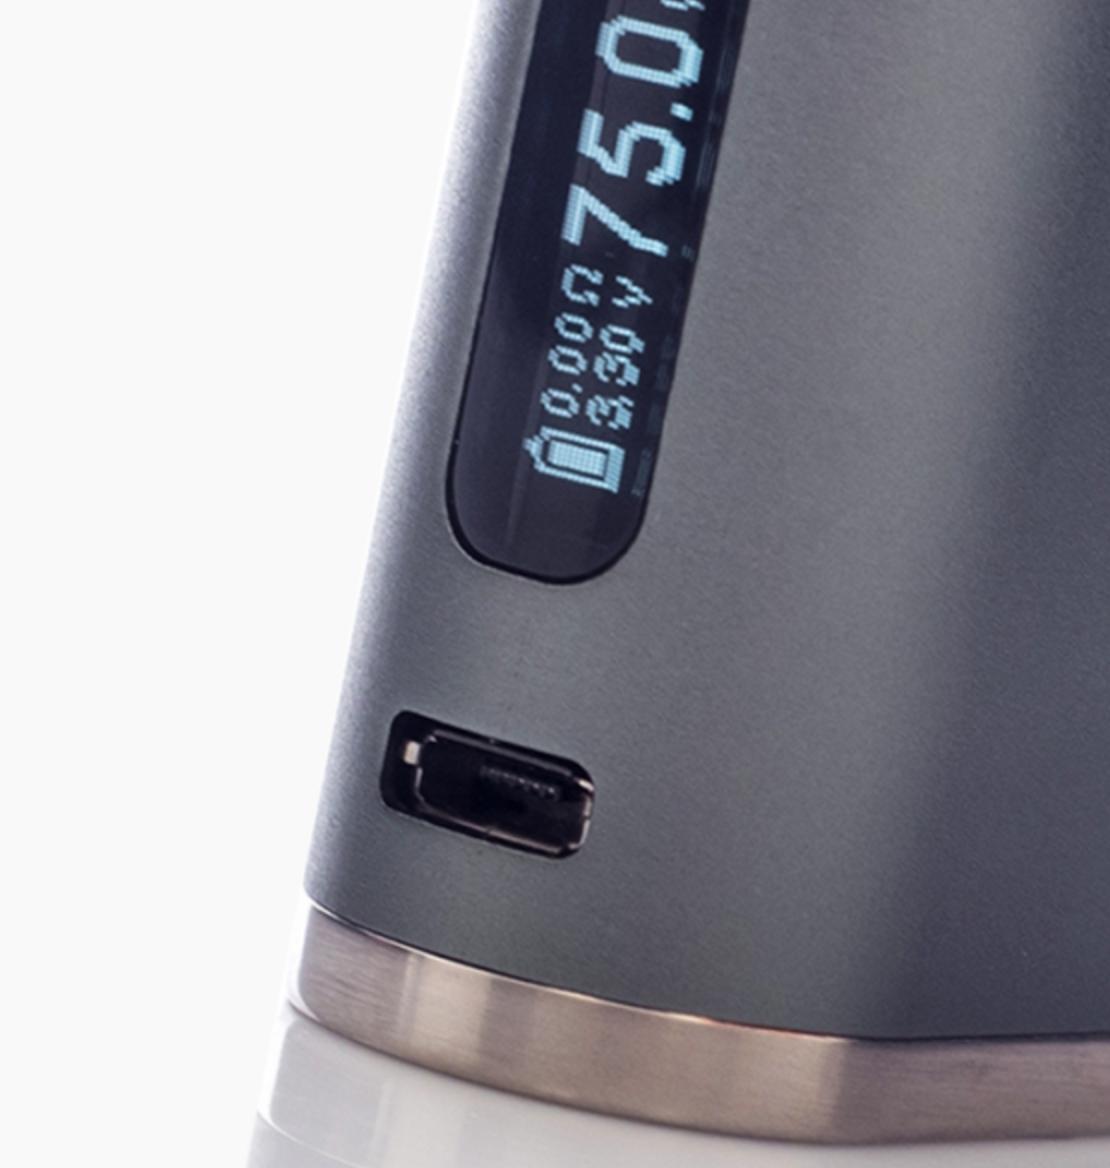 Istick Pico Kit Review Still The 1 Small Vape Mod You Can Buy Eleaf Starter 75w Vapor Vaporizer